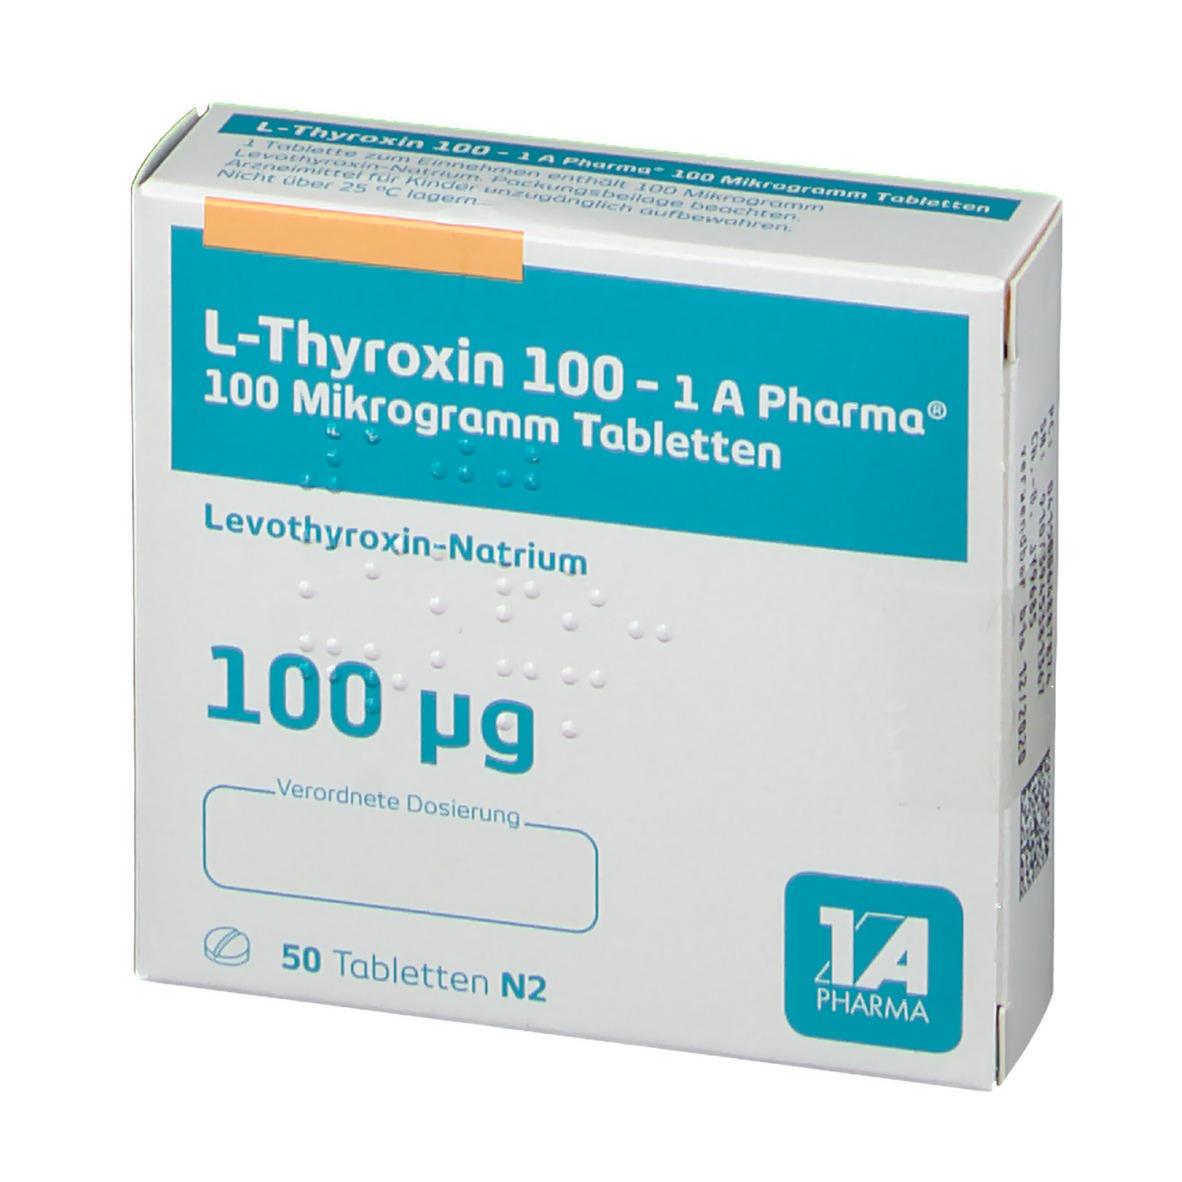 L Thyroxin 100 Abnehmen